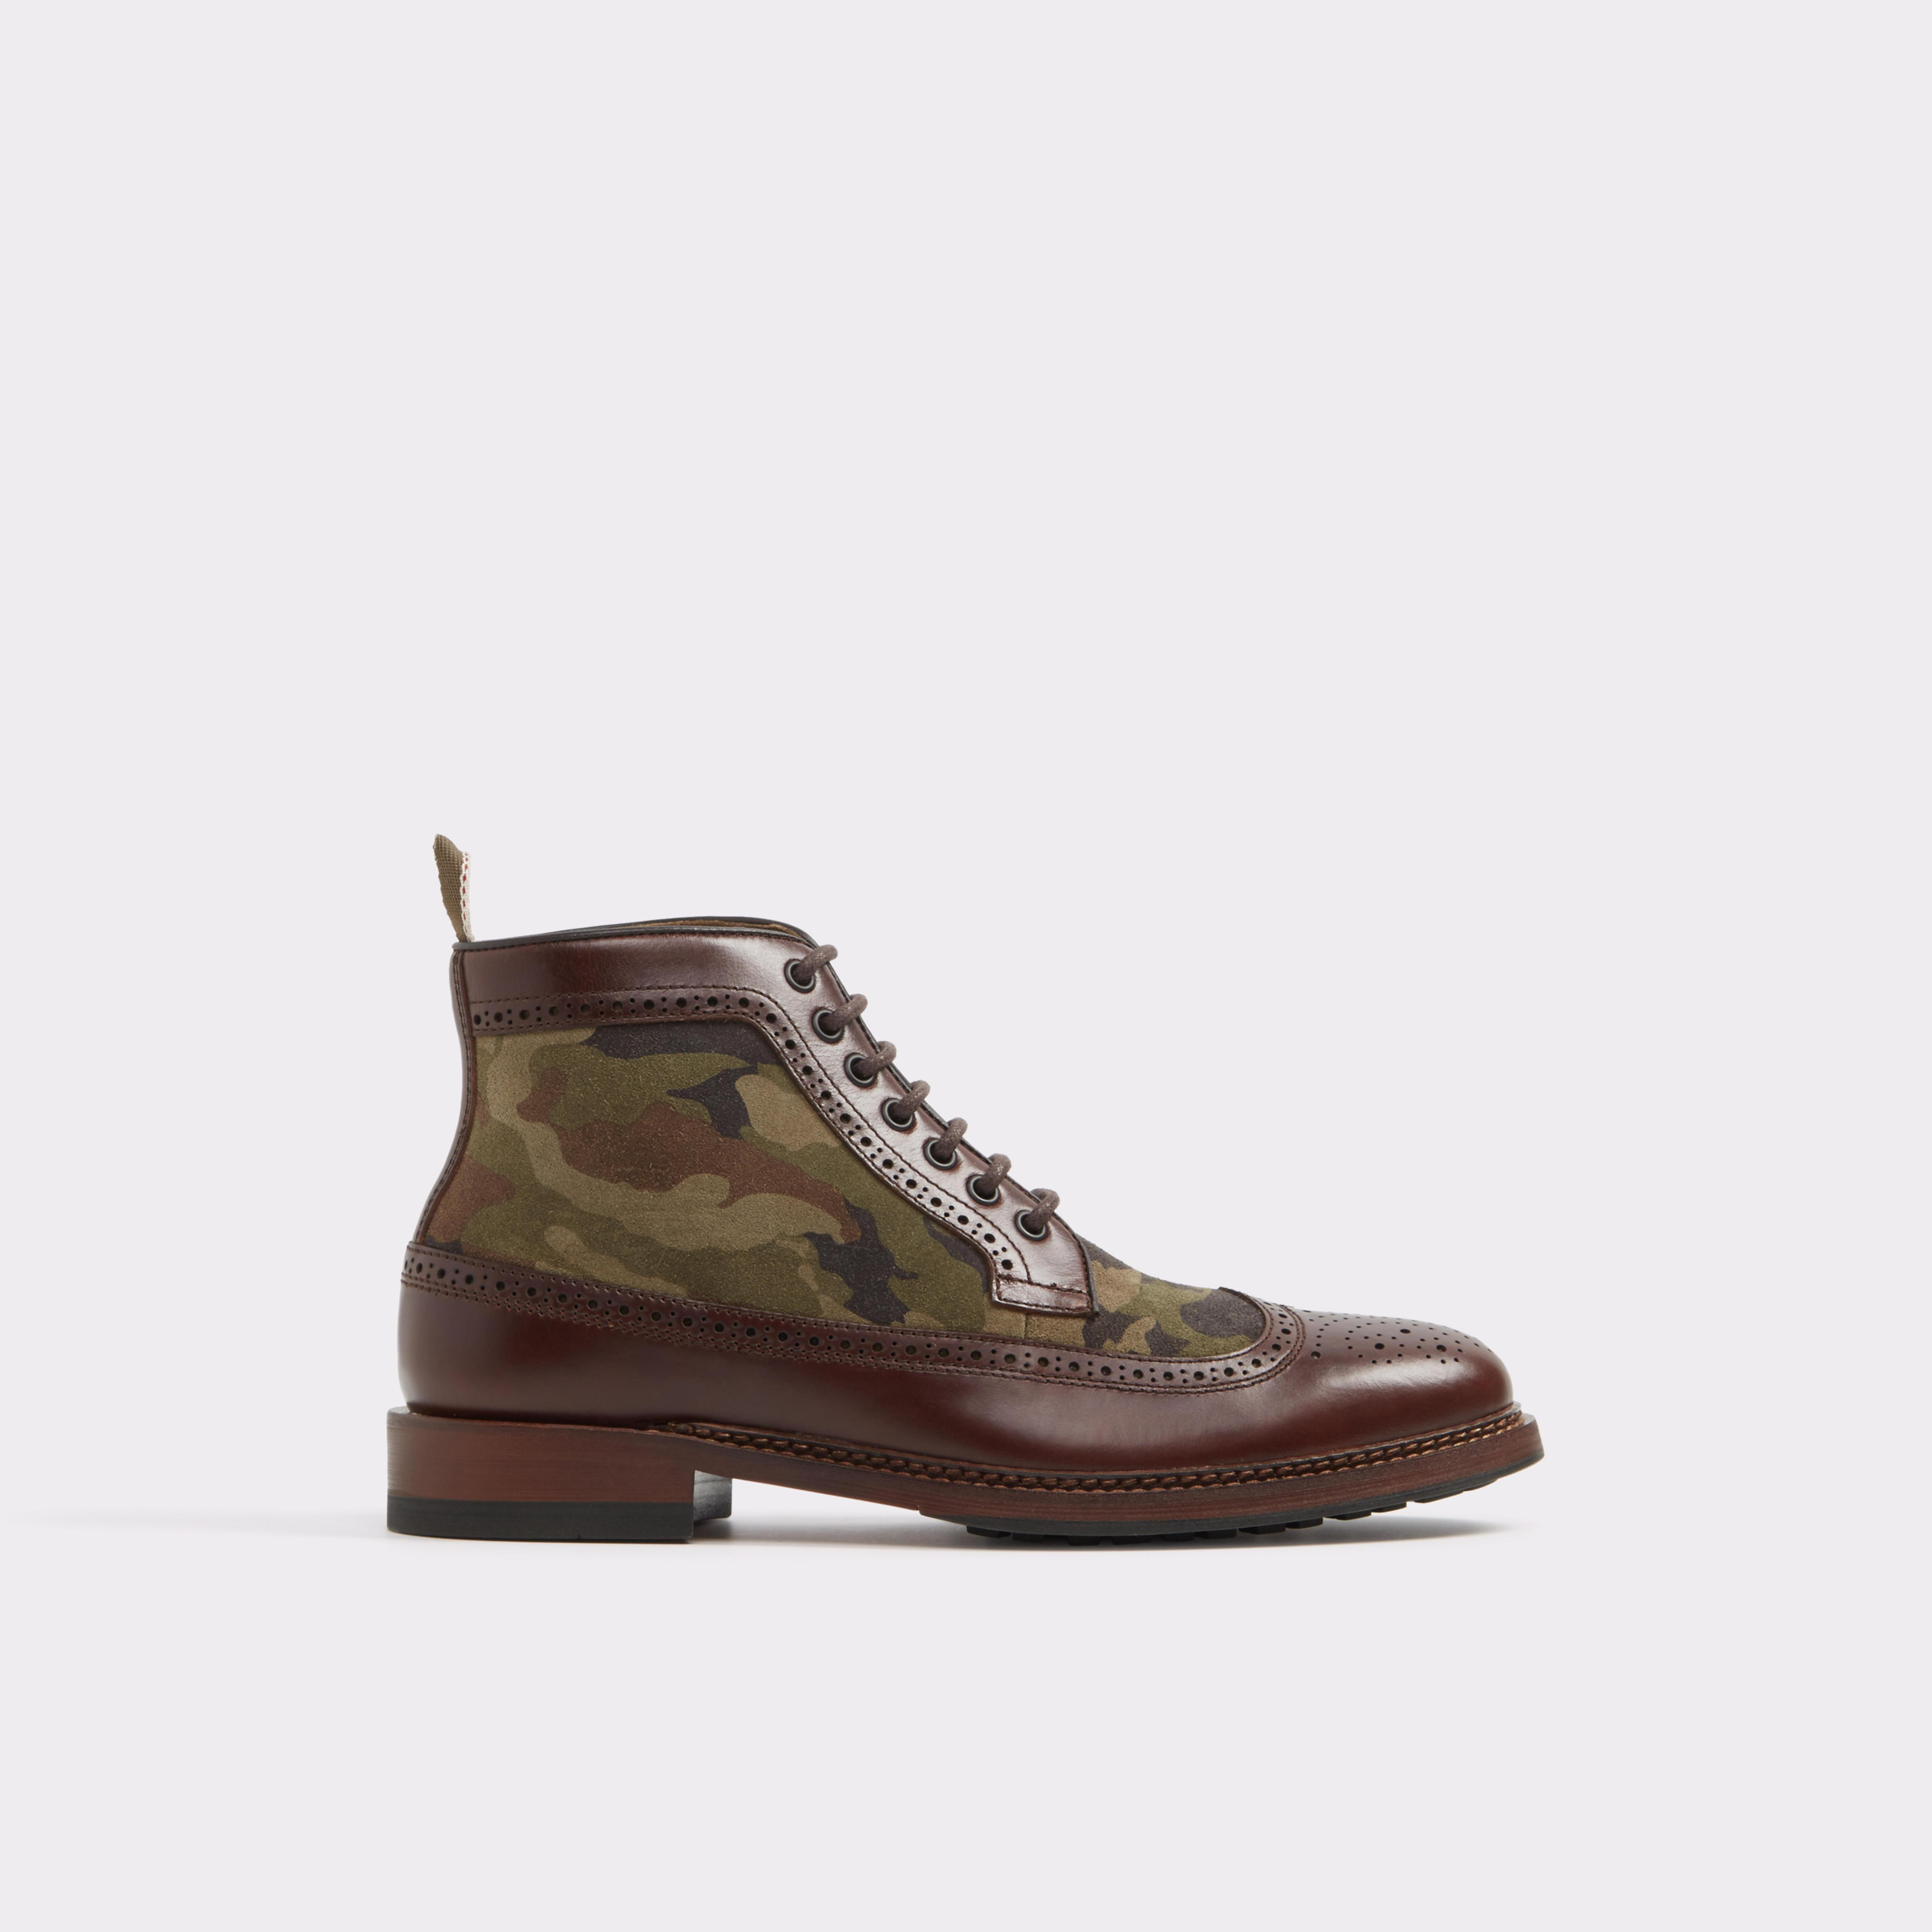 ALDO POIANA - Classic ankle boots - brown 8Aoi8UNL9V